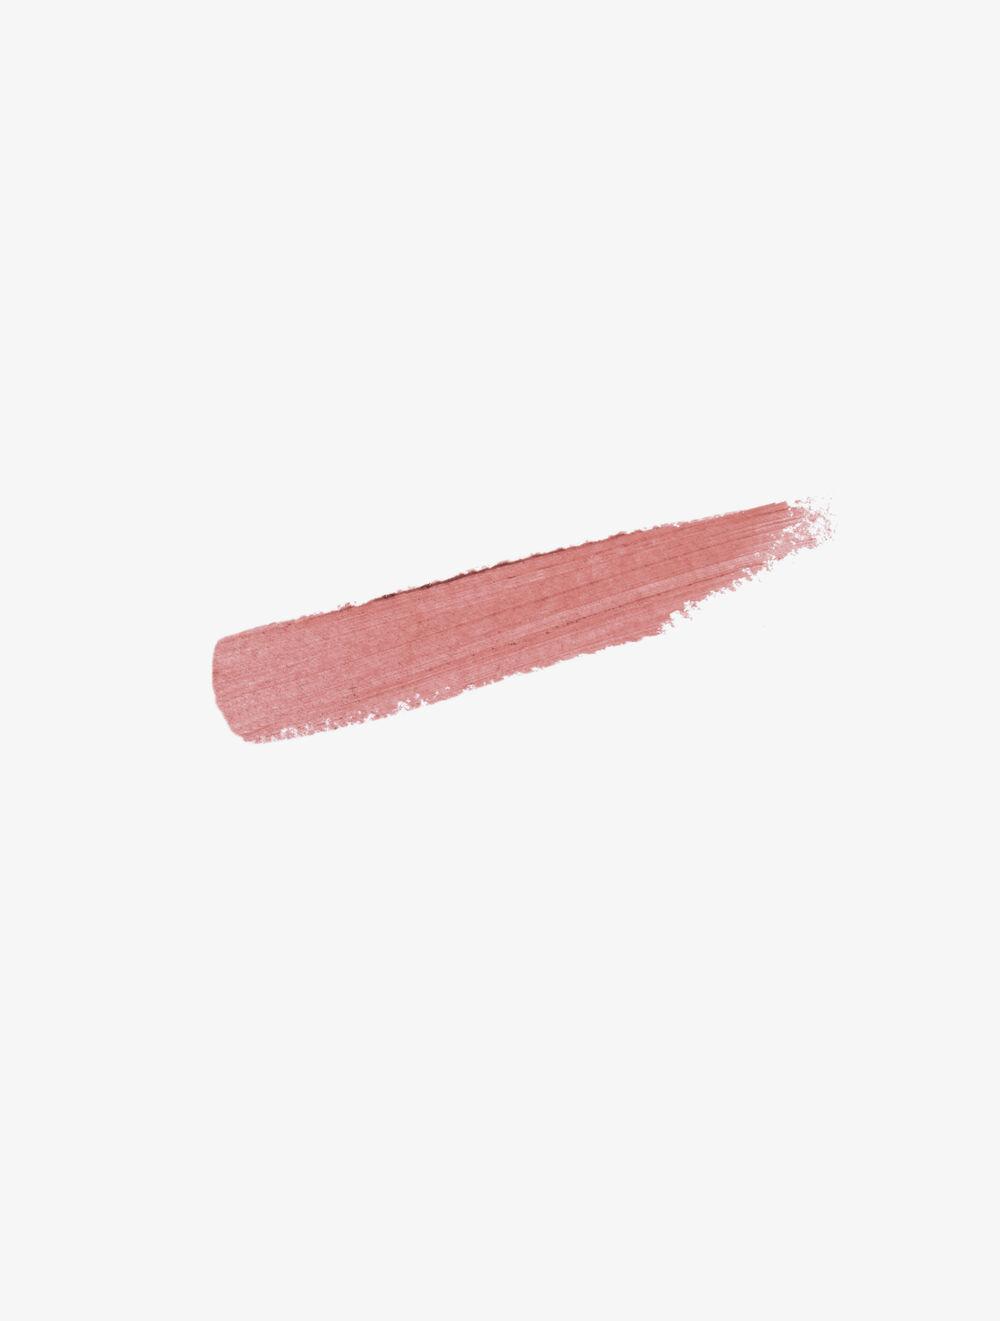 Phyto-Lip Shine N°4 Sheer Rosewood